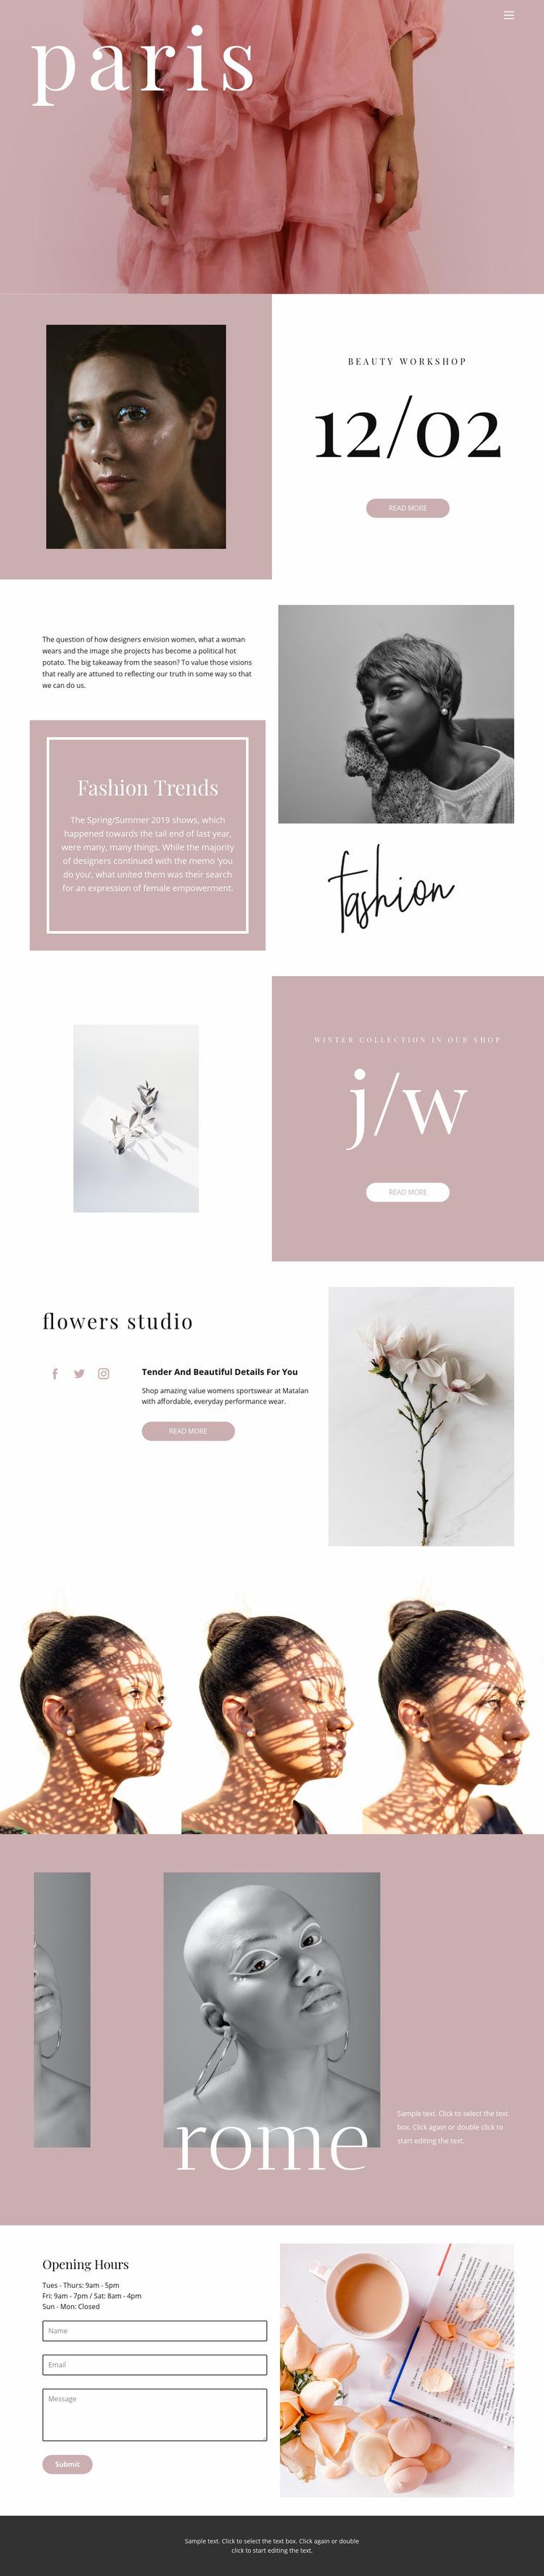 French fashion Web Page Design